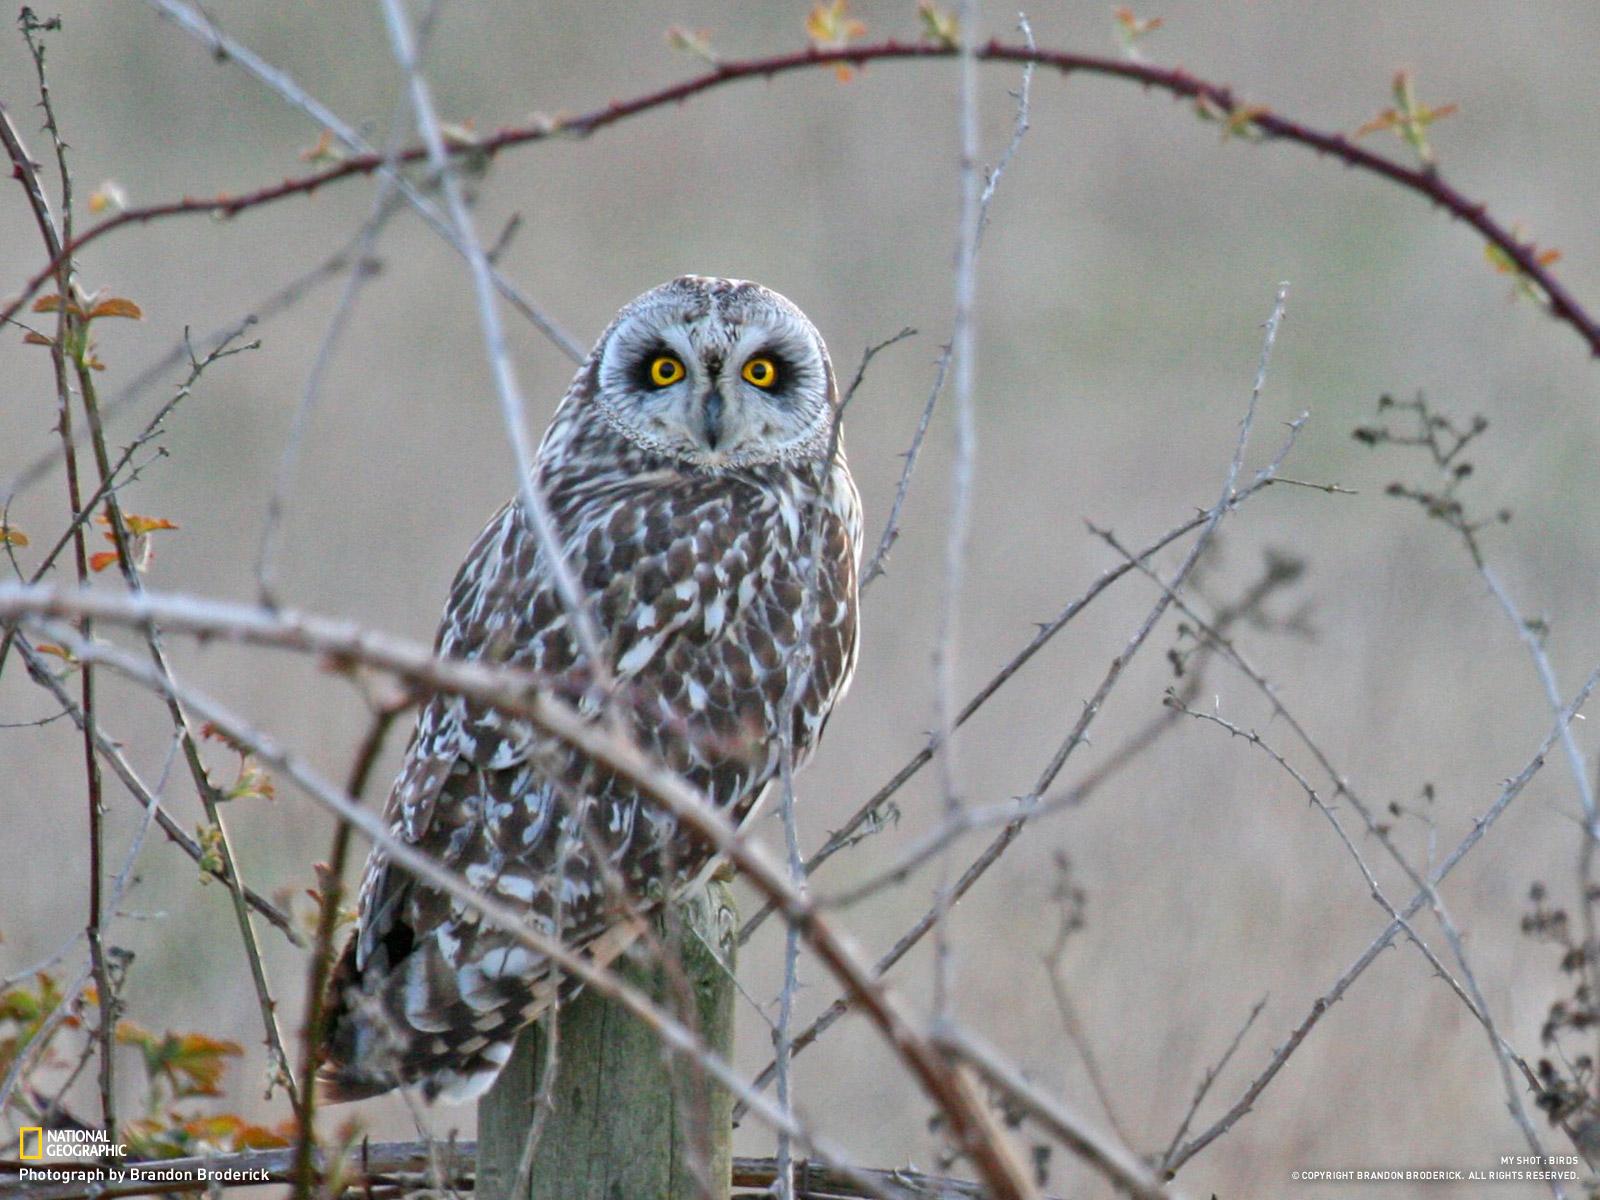 Bird Wallpapers - The BackYard Naturalist | The BackYard ...